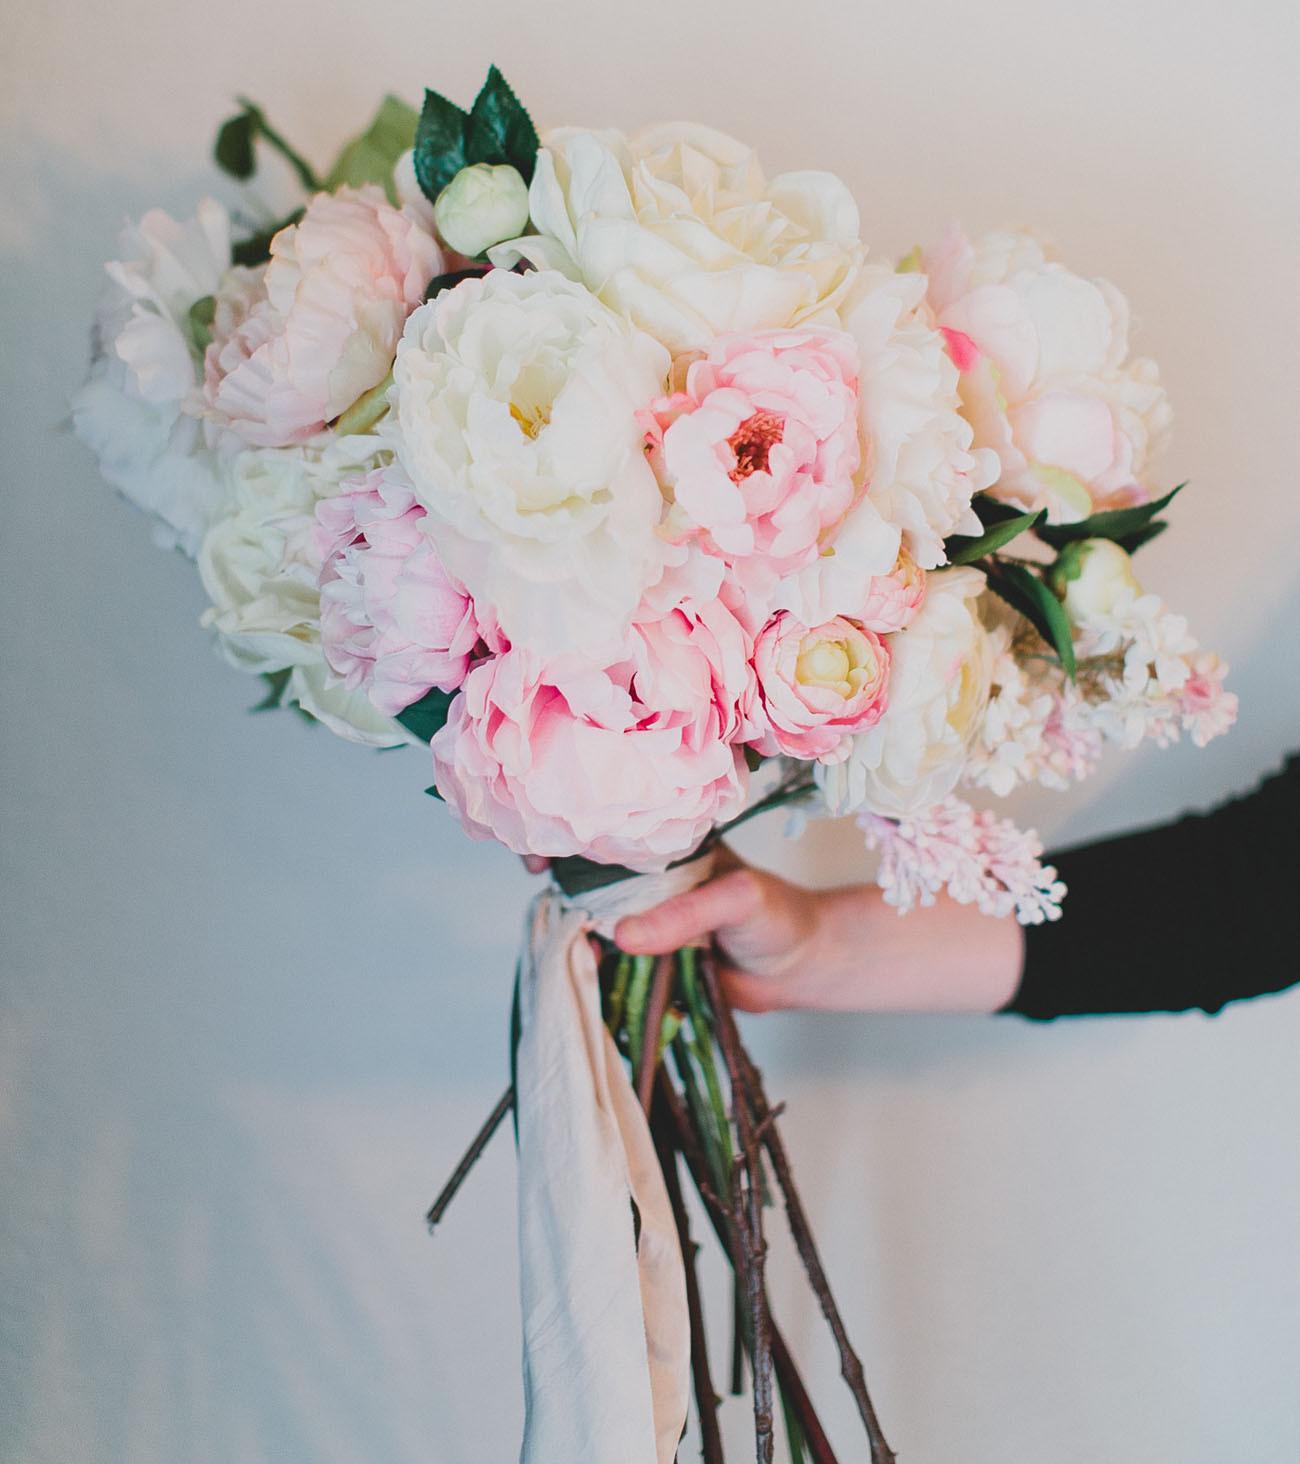 Wedding Bouquets DIY  DIY Silk Flower Bouquet with Afloral